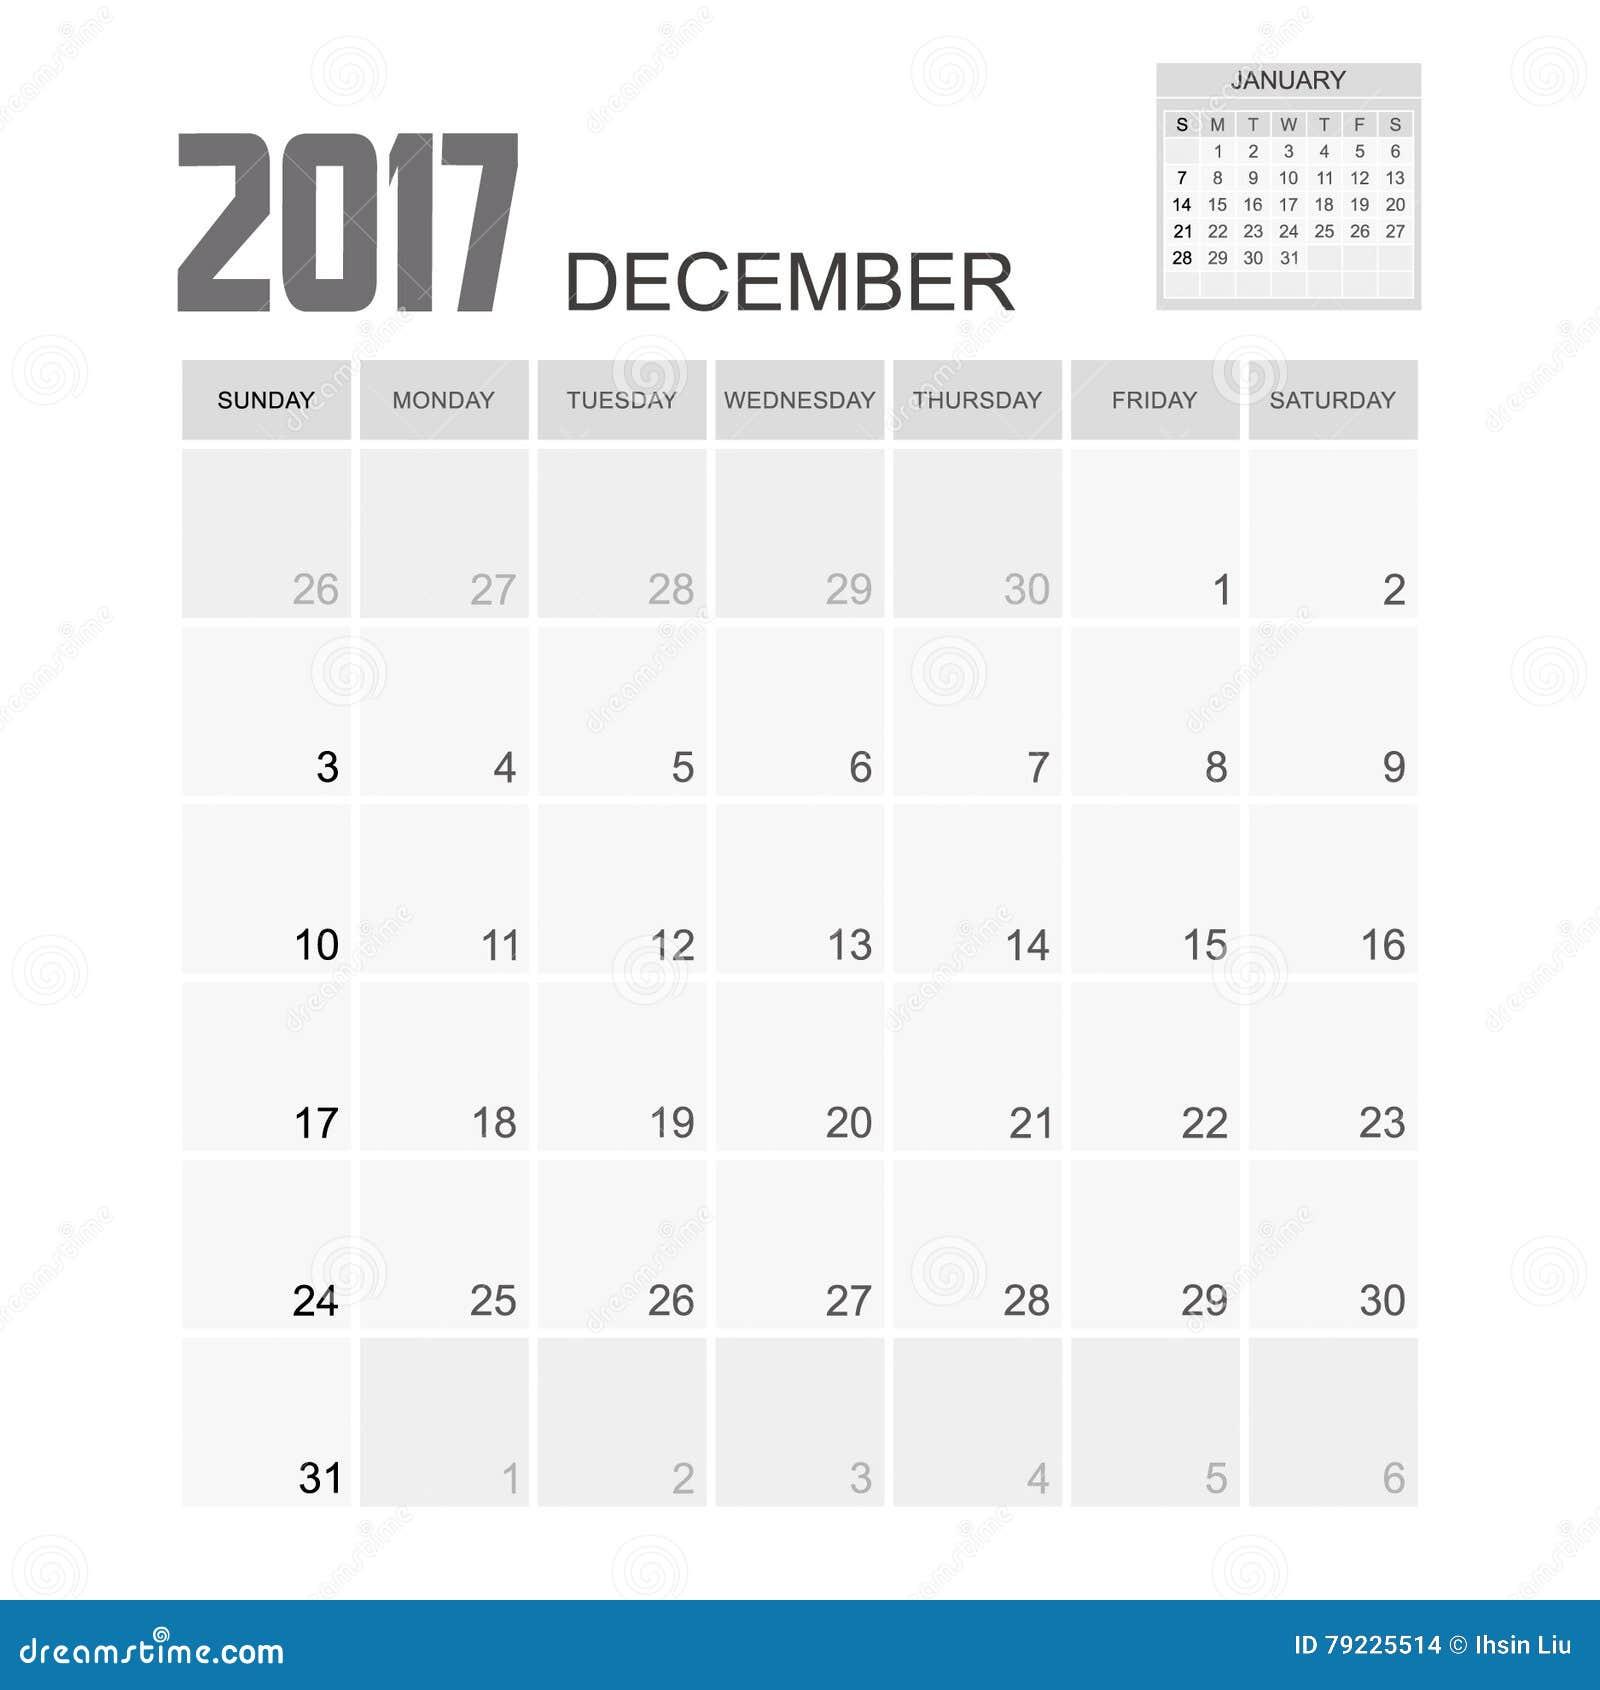 Calendar Design Illustrator : December planner design vector illustration